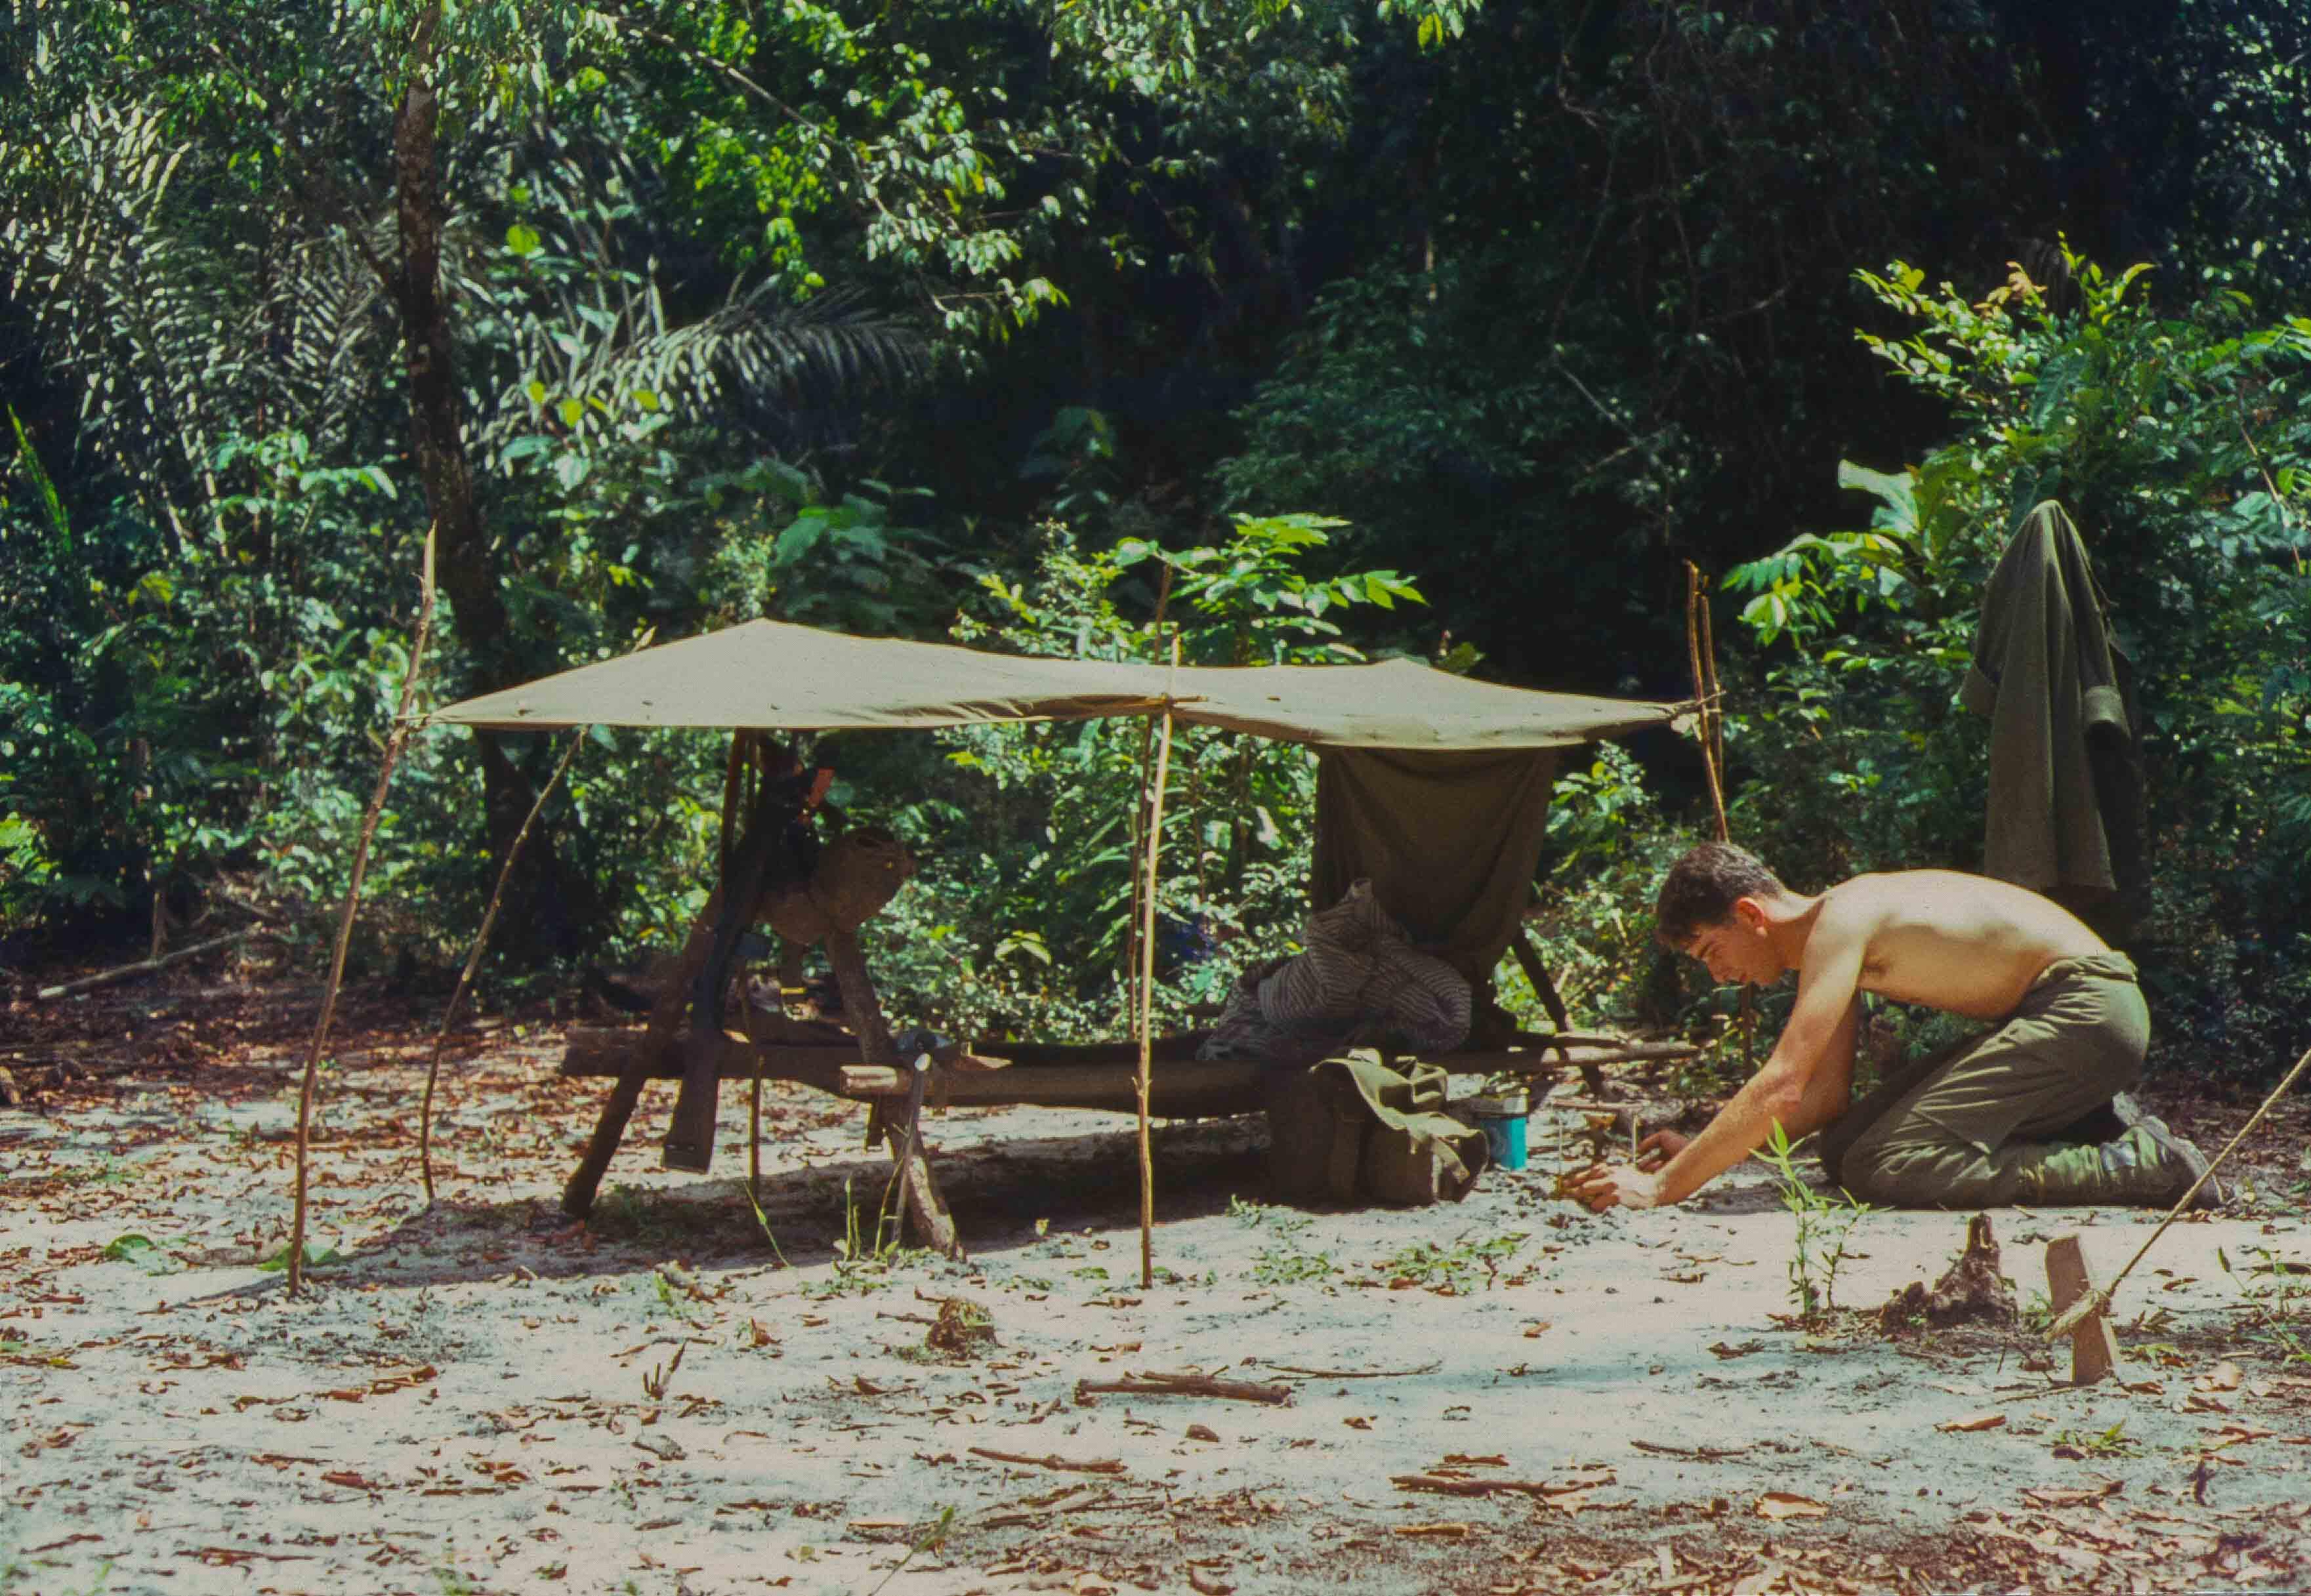 91. Suriname